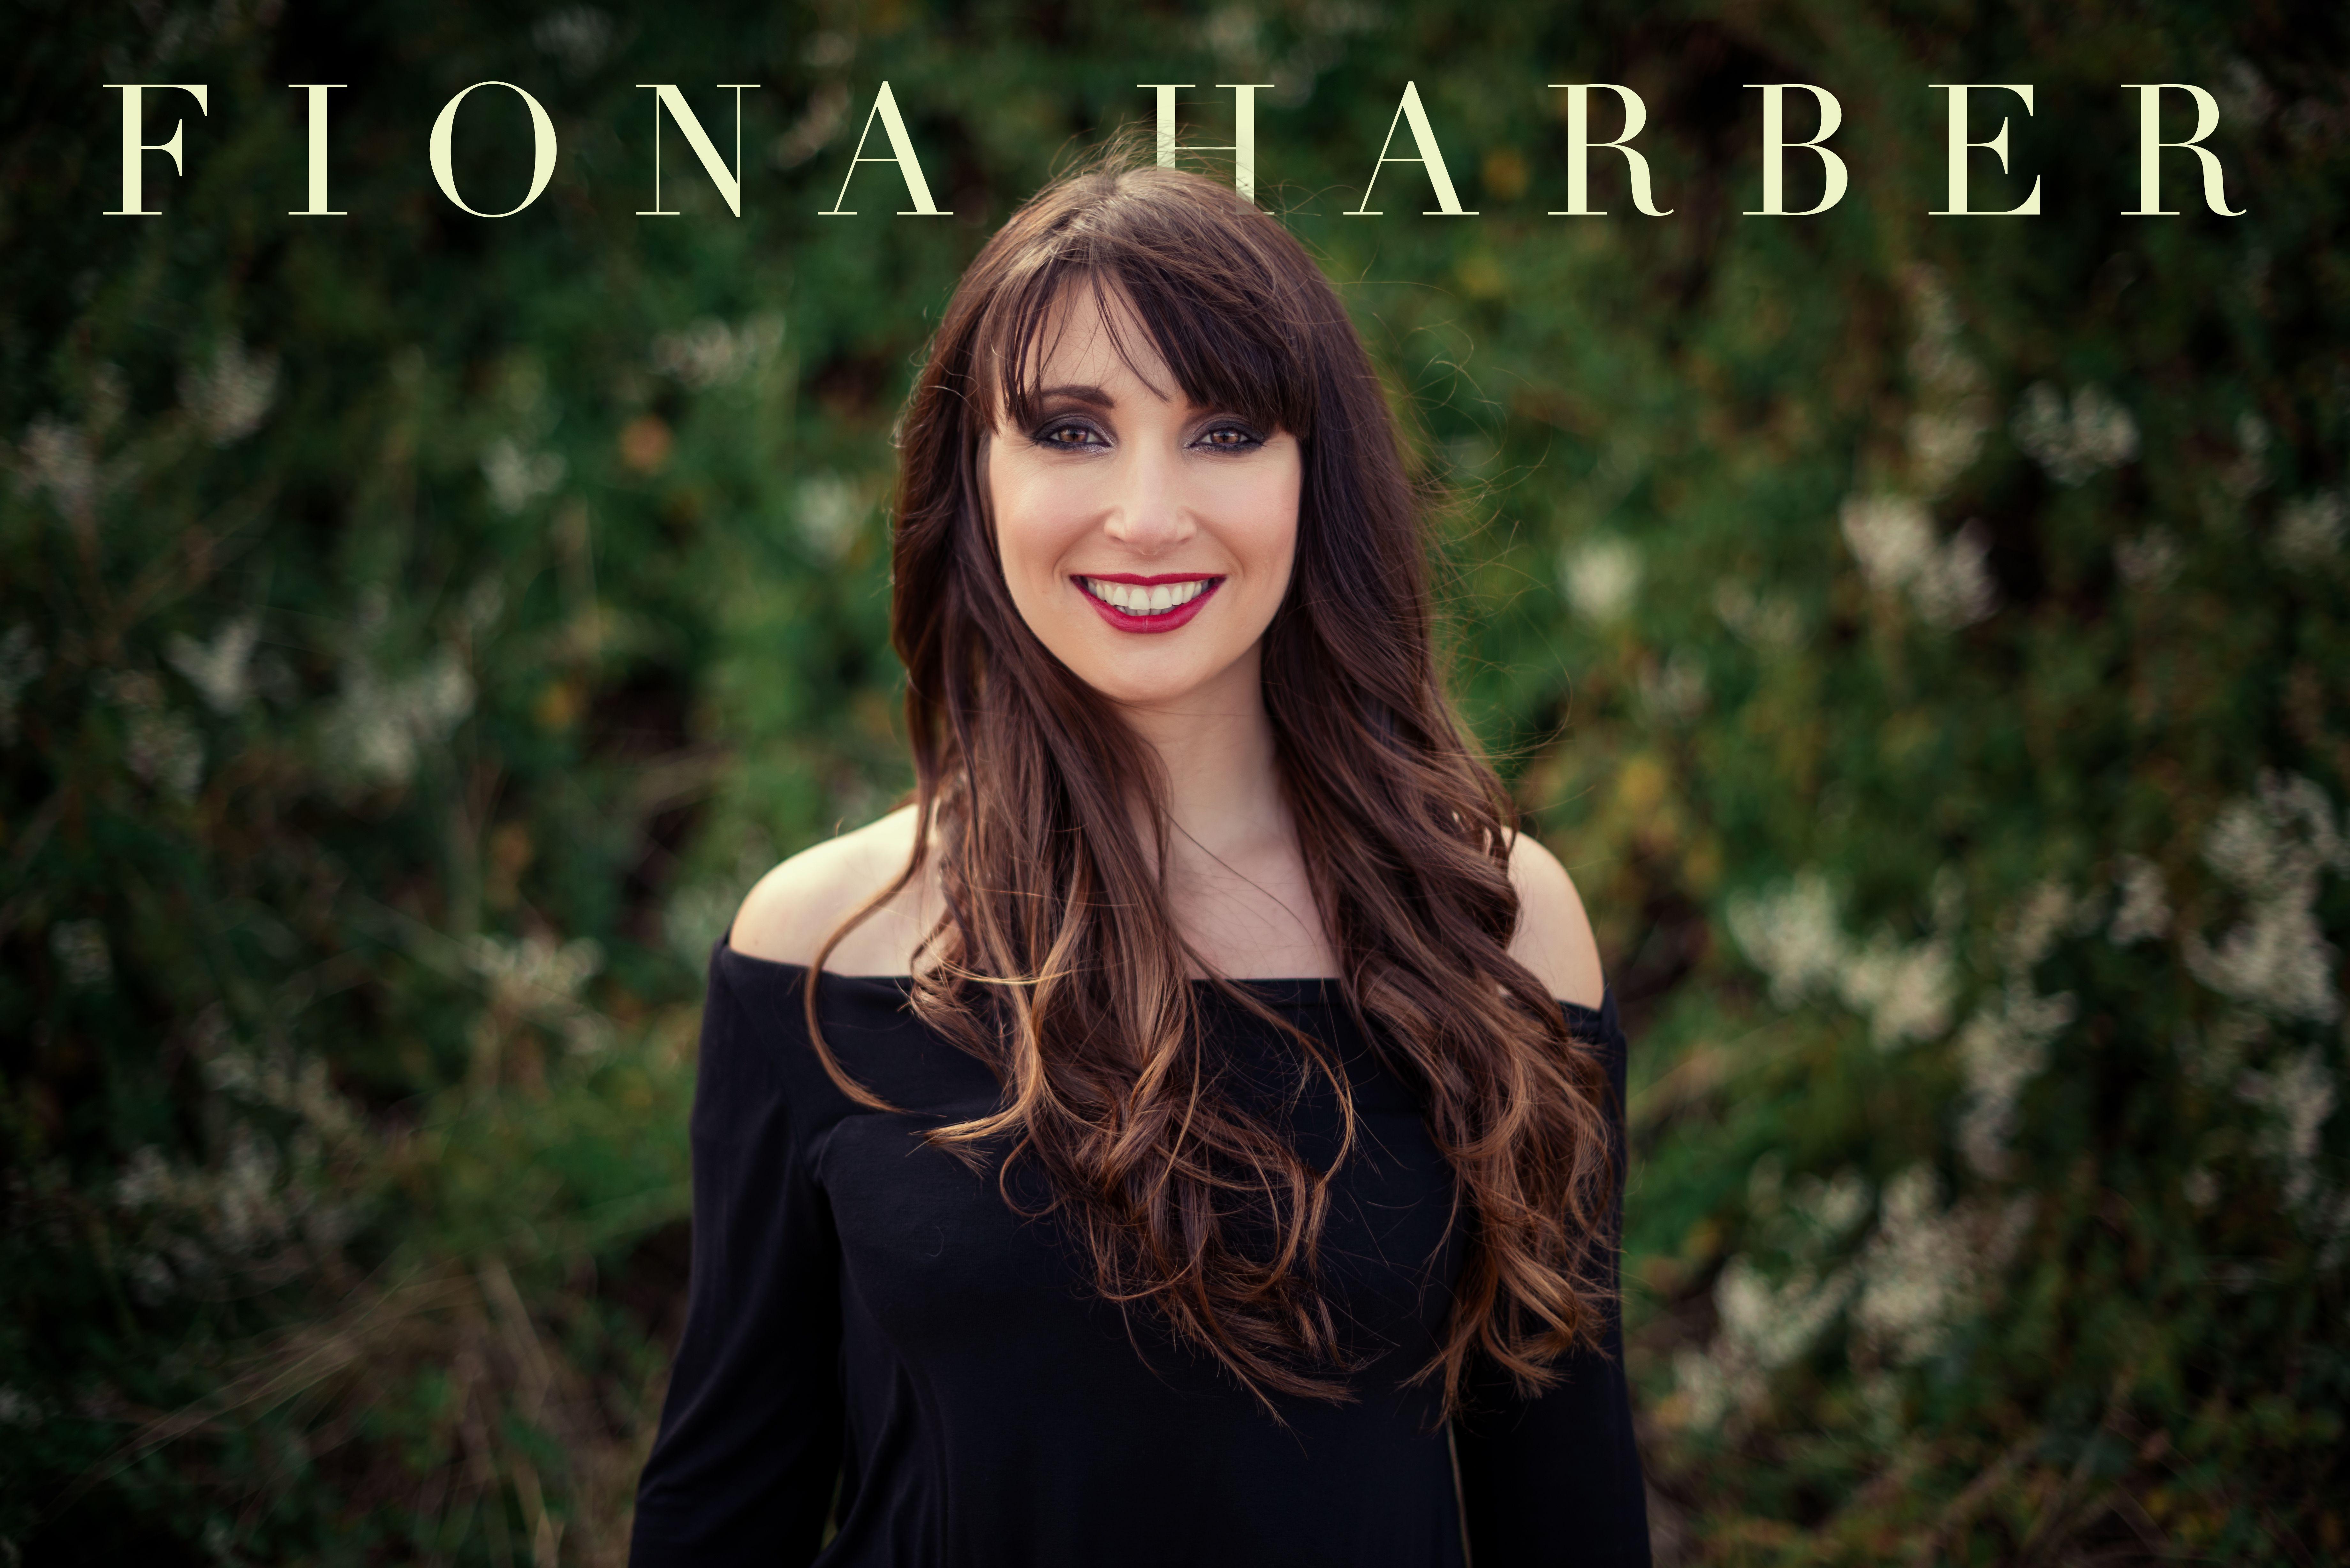 Fiona Harber